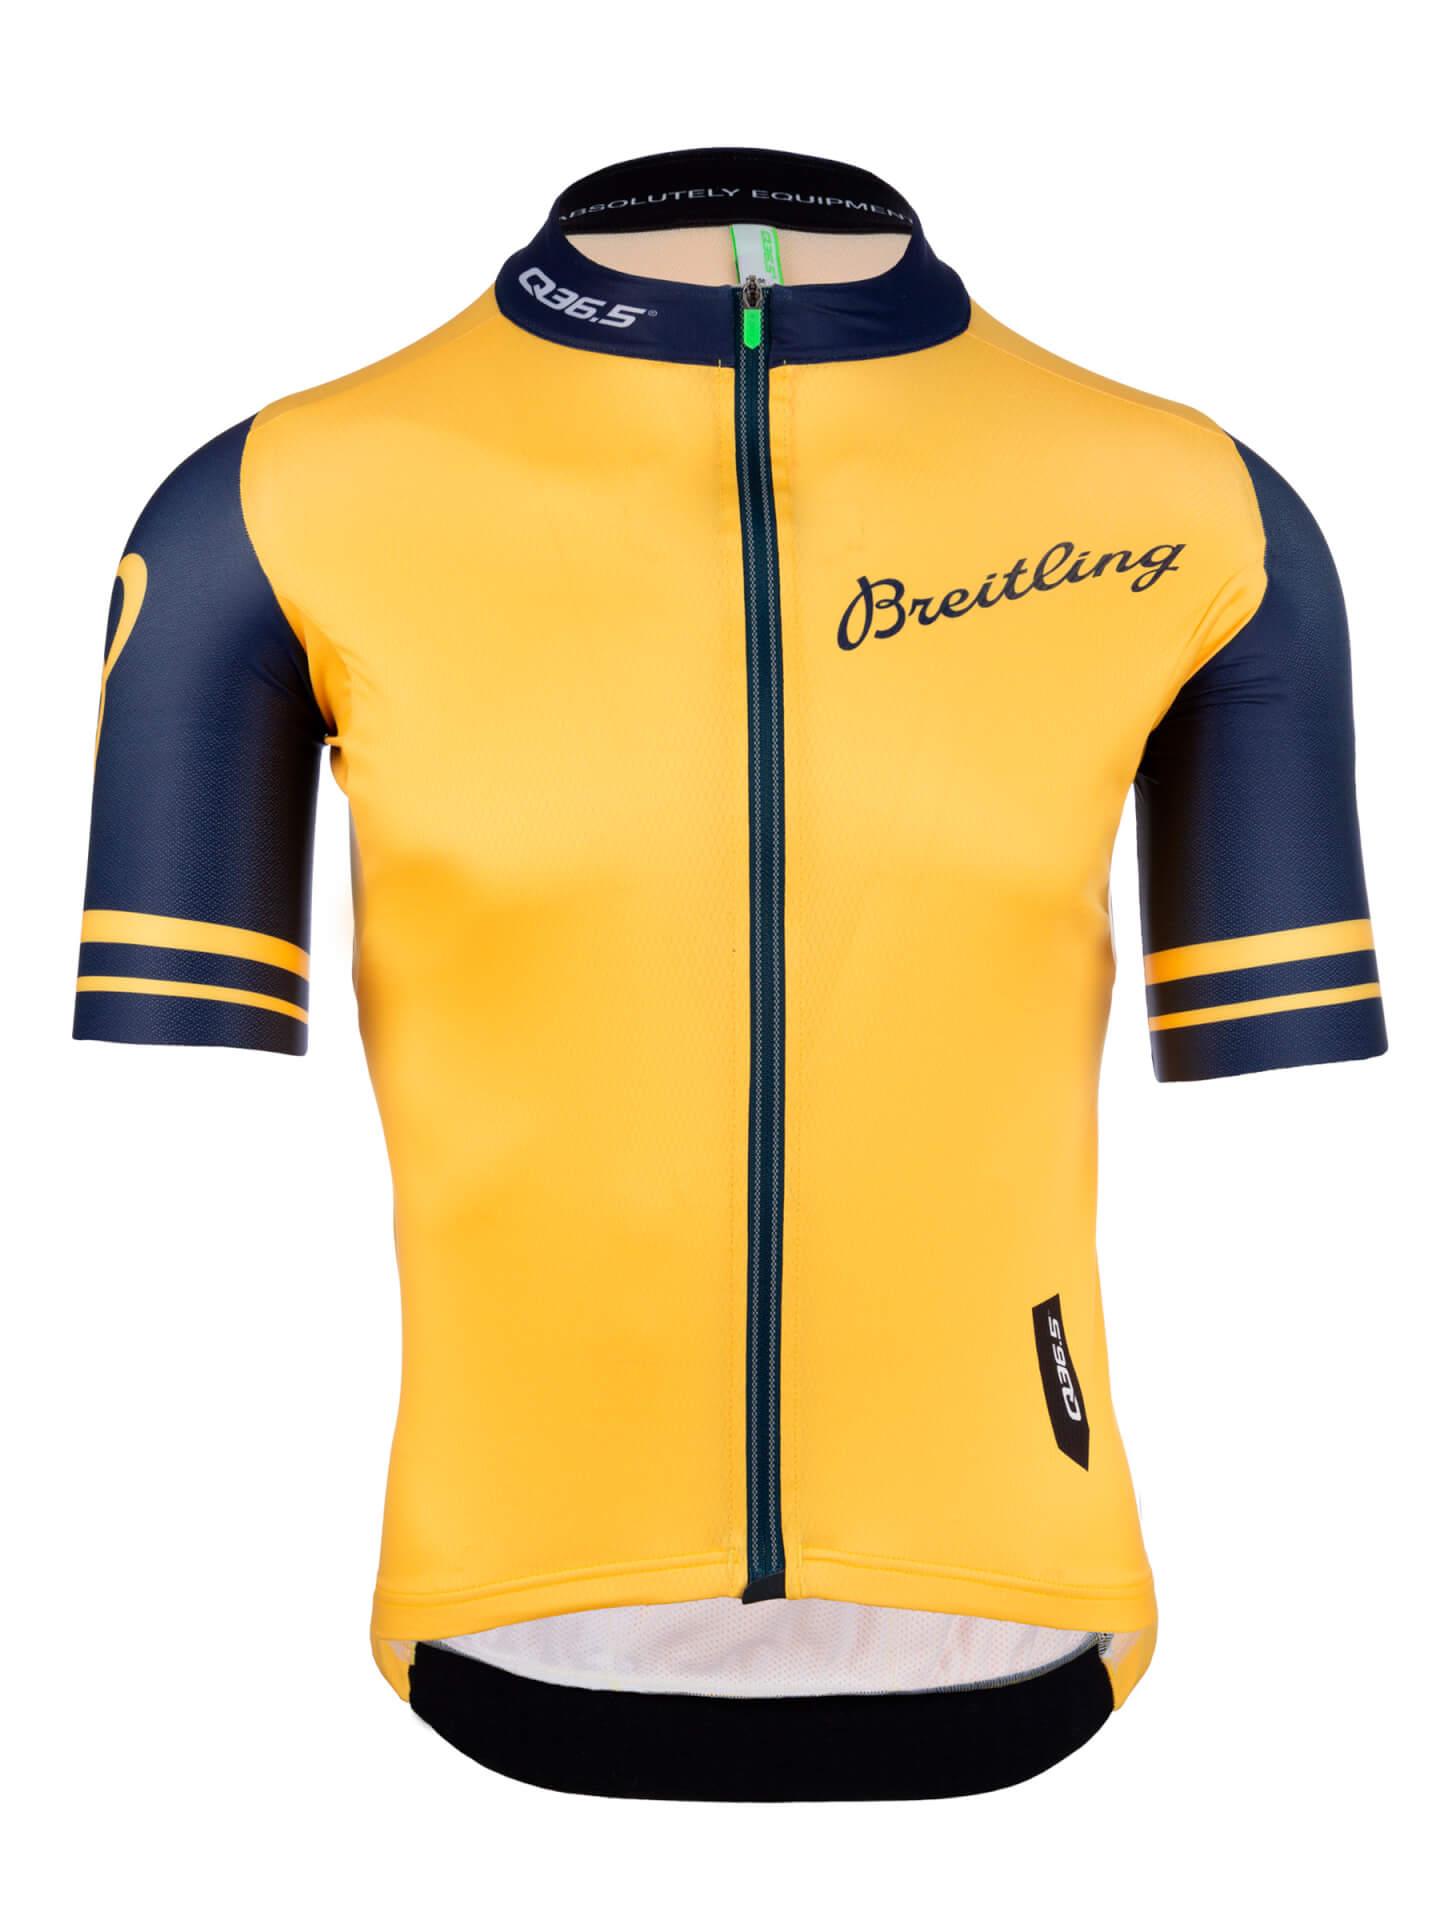 Jersey-short-sleeve-G1-Breitling